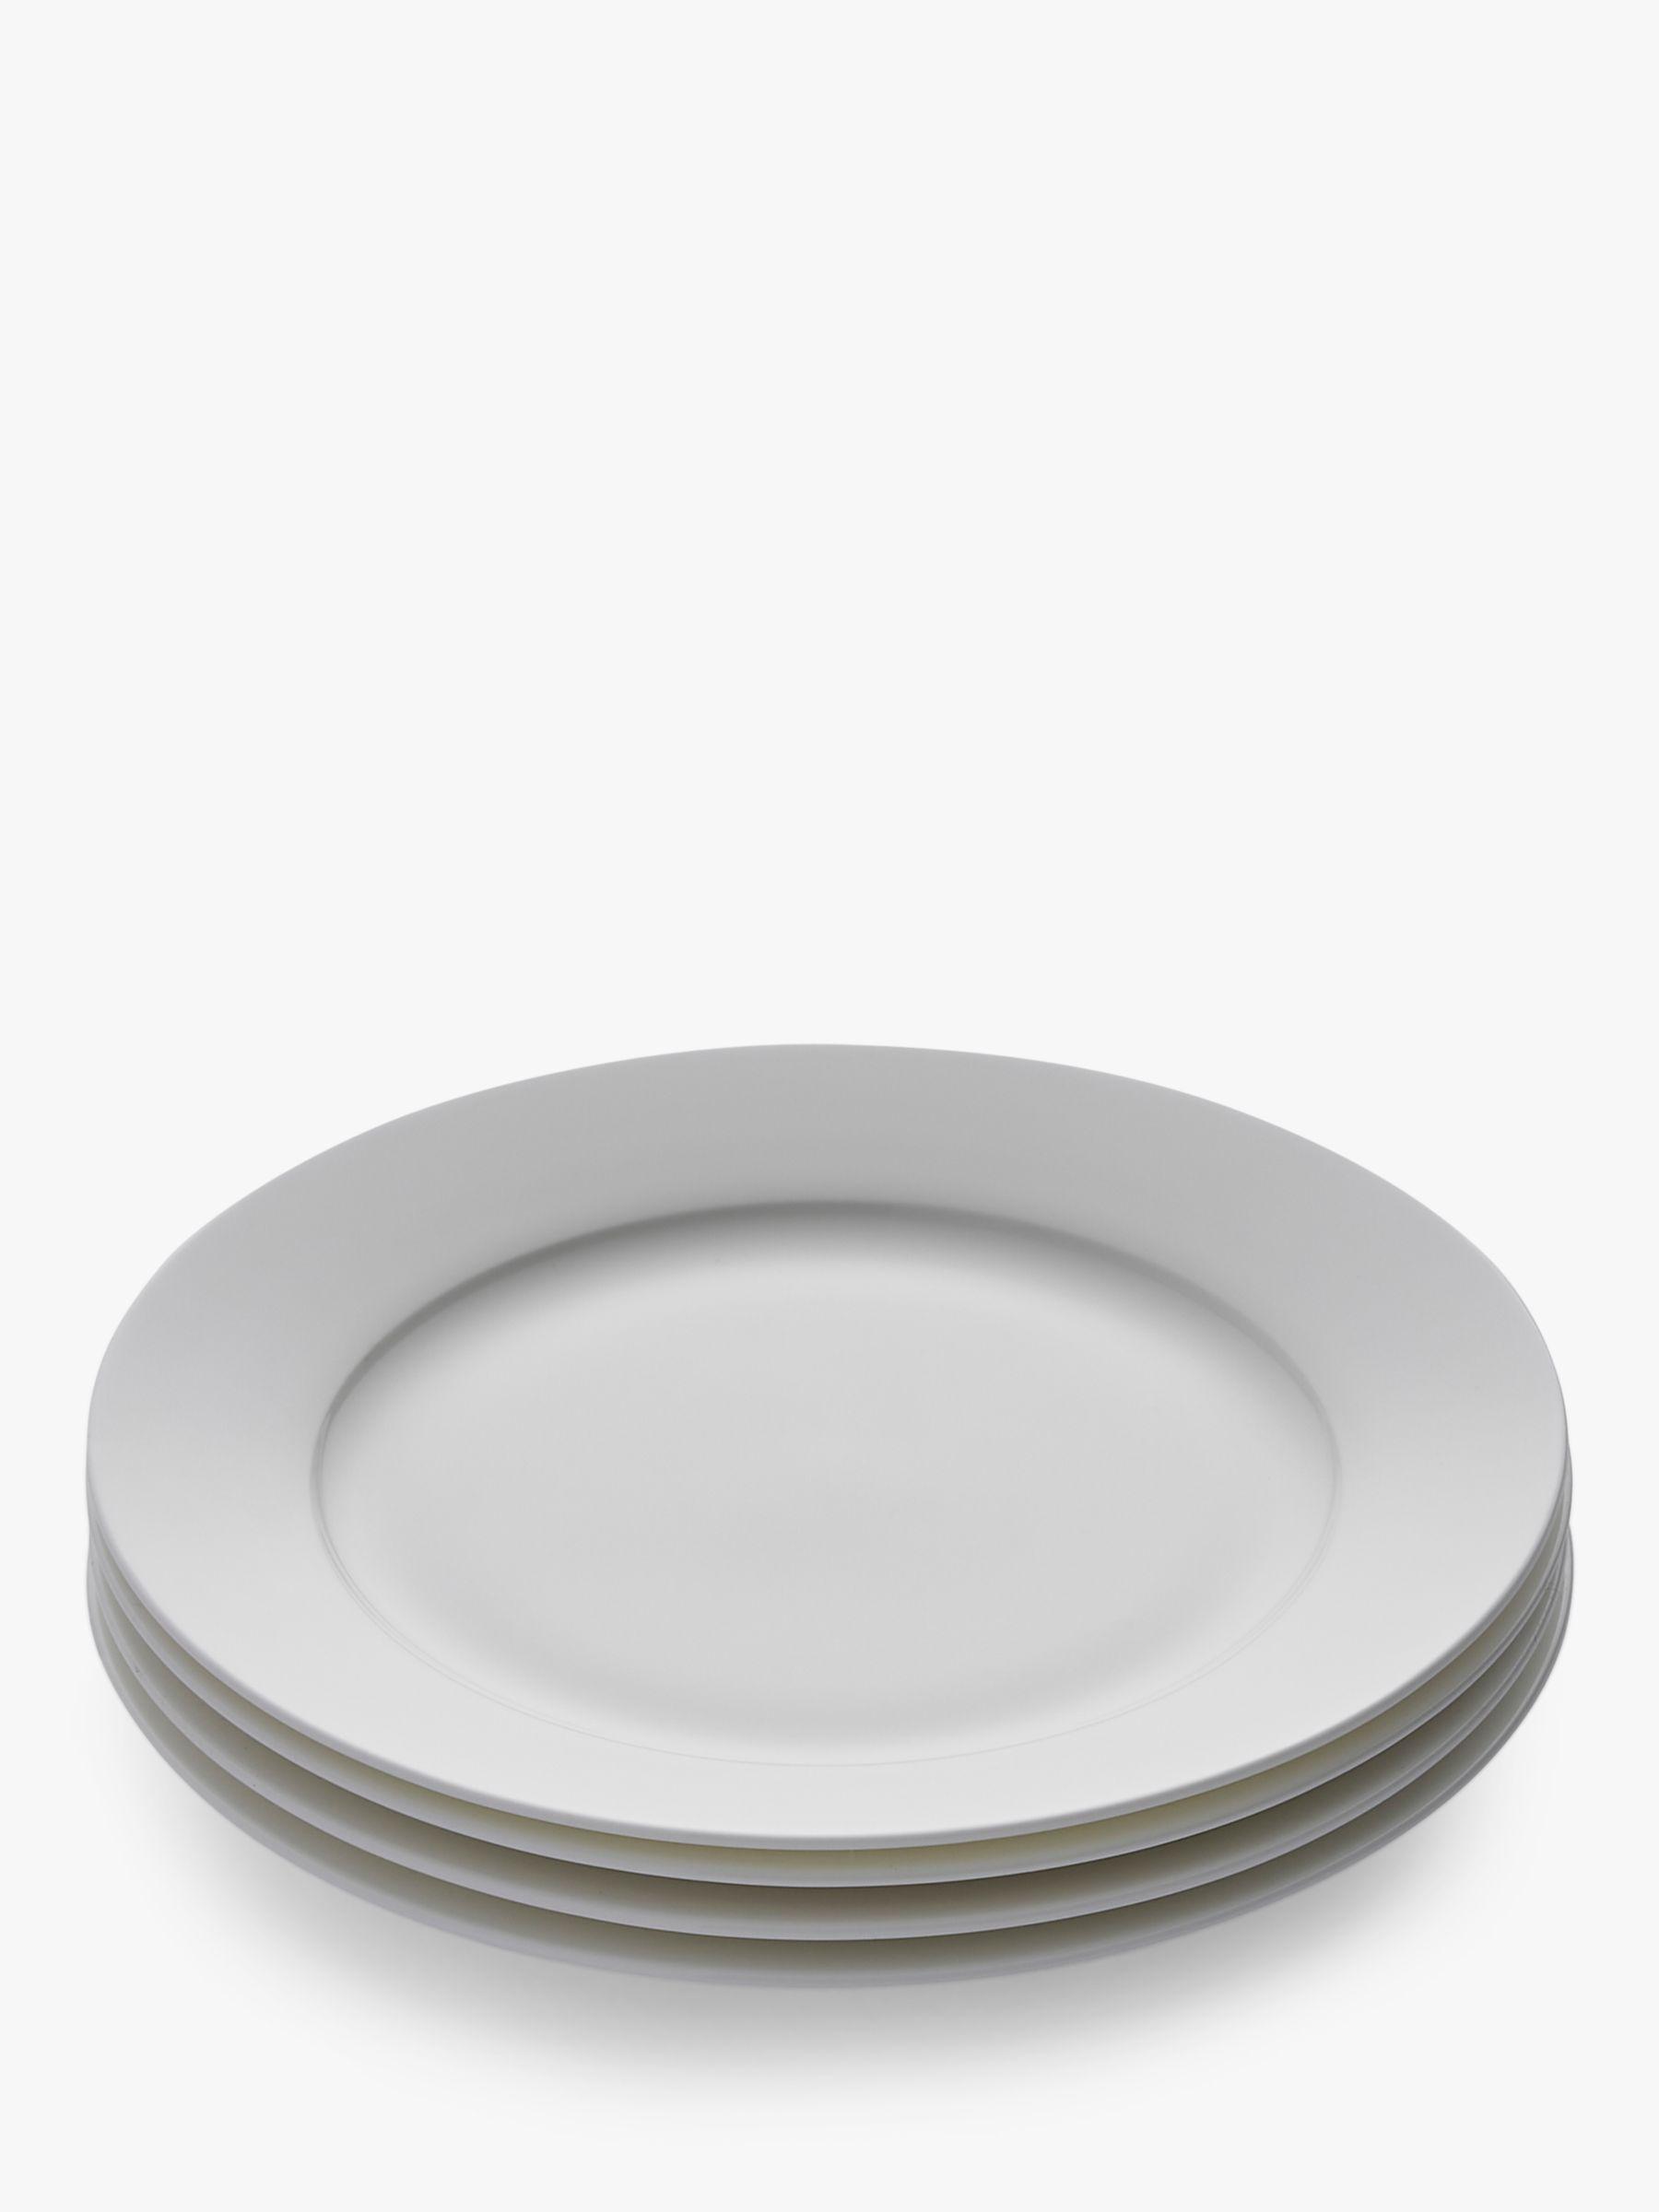 Royal Worcester Royal Worcester Serendipity Bone China Dessert Plates, 21cm, Set of 4, White